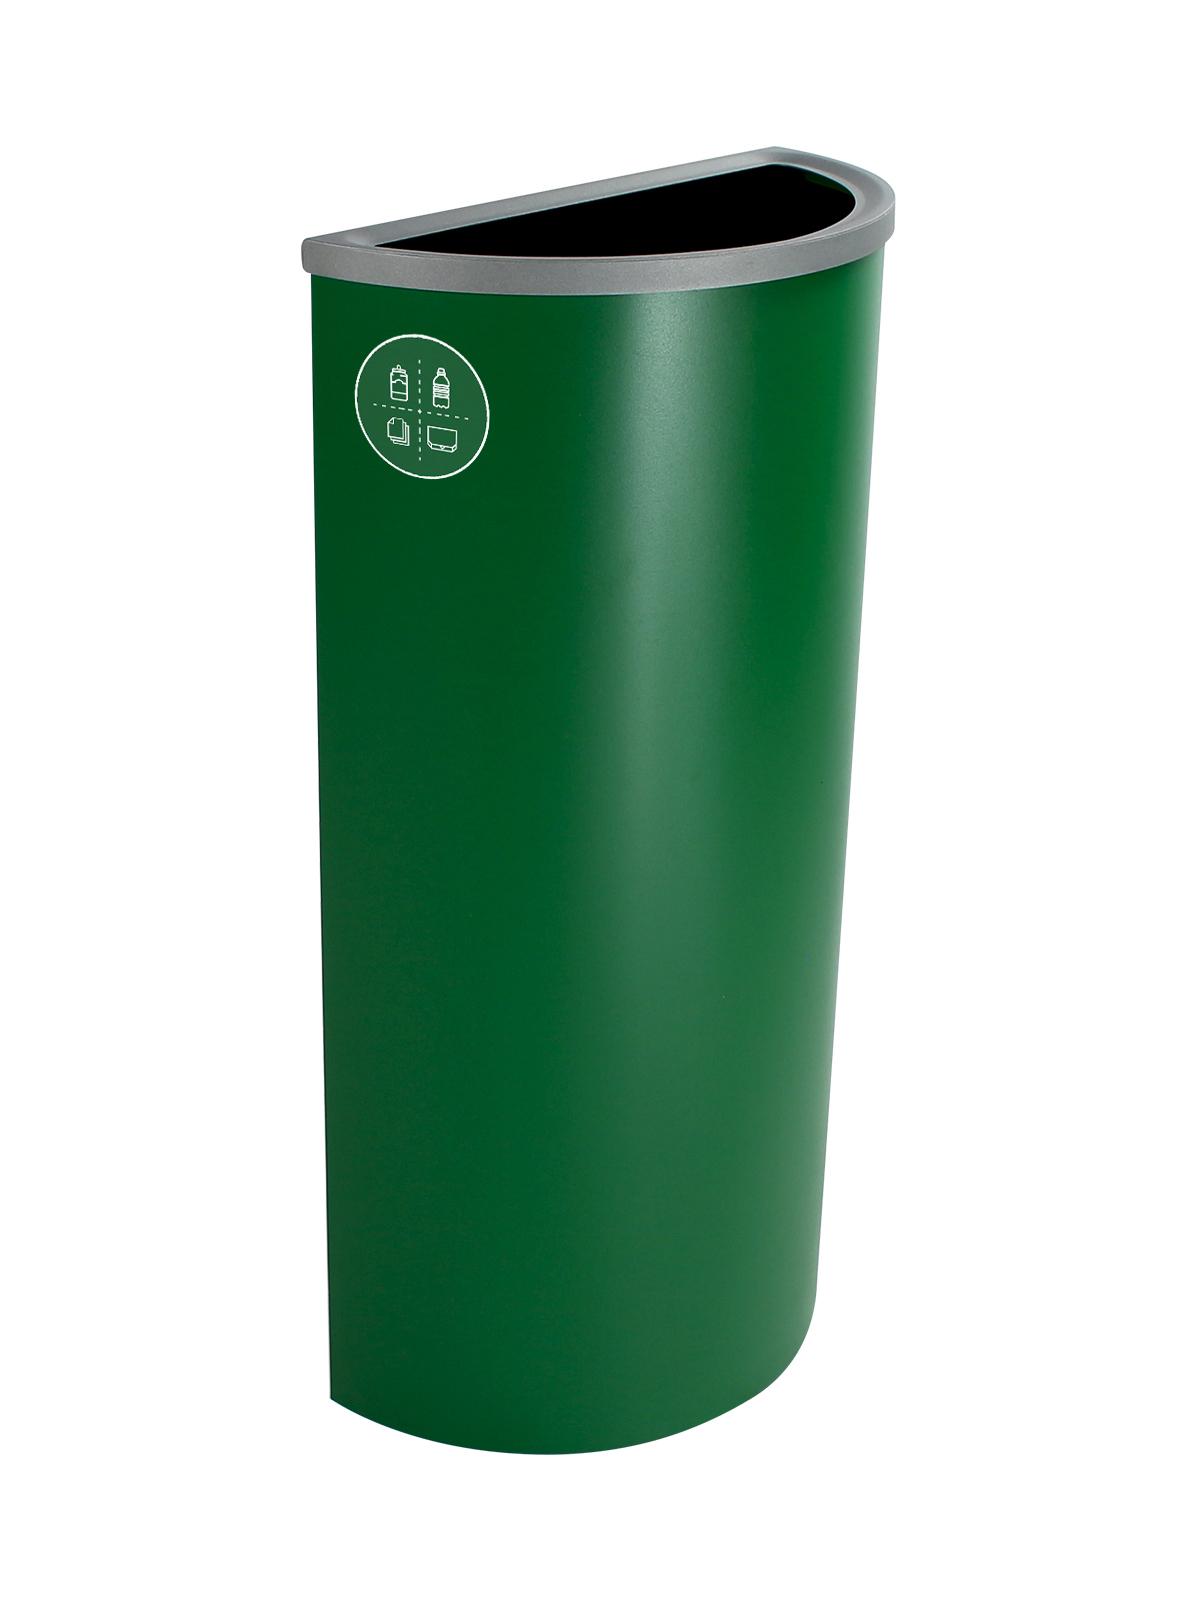 SPECTRUM - Single - Ellipse Slim - Mixed Recyclables - Full - Dark Green